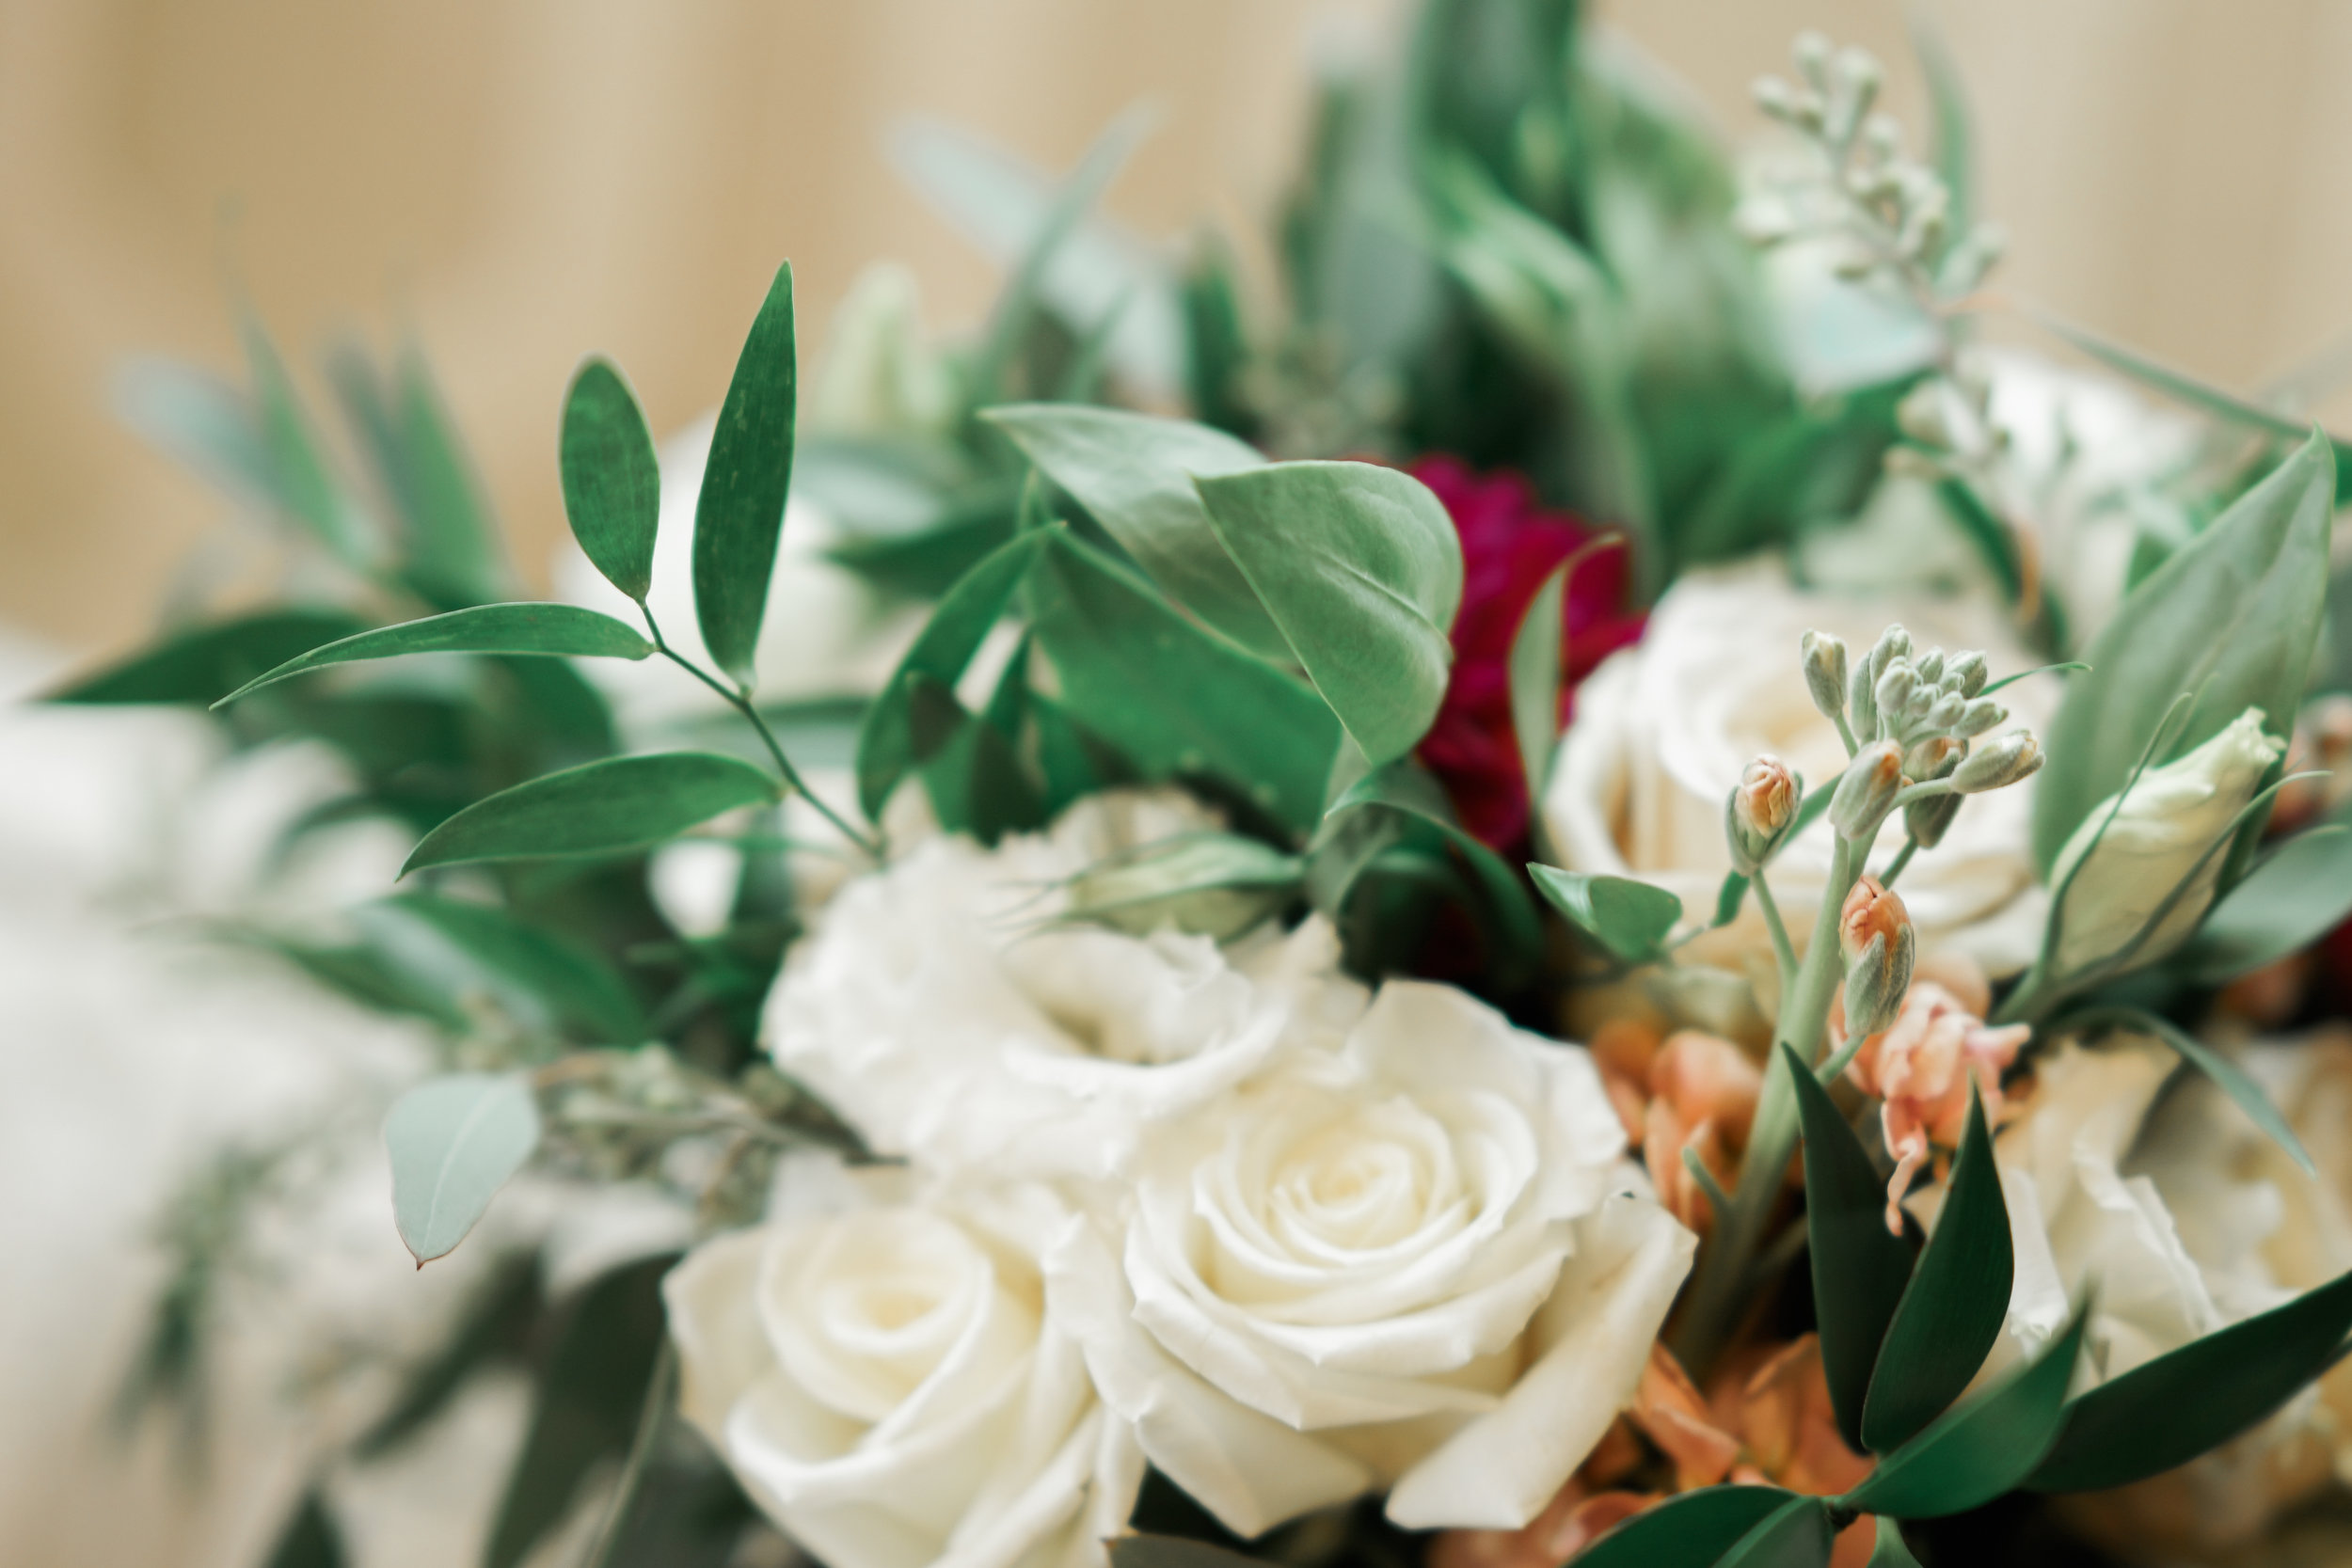 Canyonwood Ridge wedding photographer based out of Austin, Texas. Blooms by HEB.